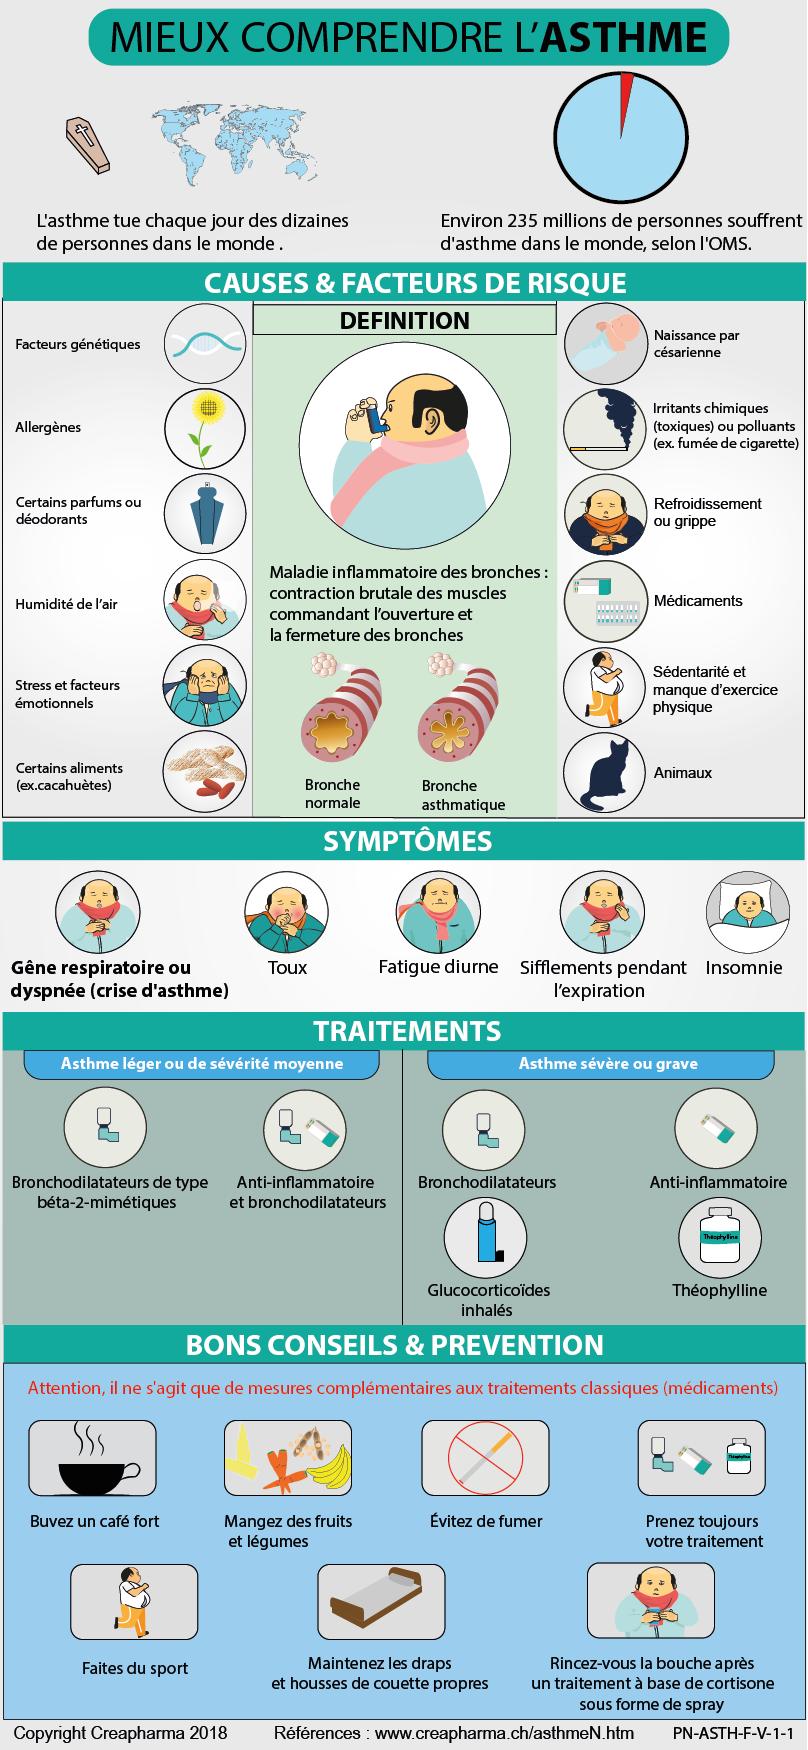 Asthme : causes, symptômes & traitements   Creapharma